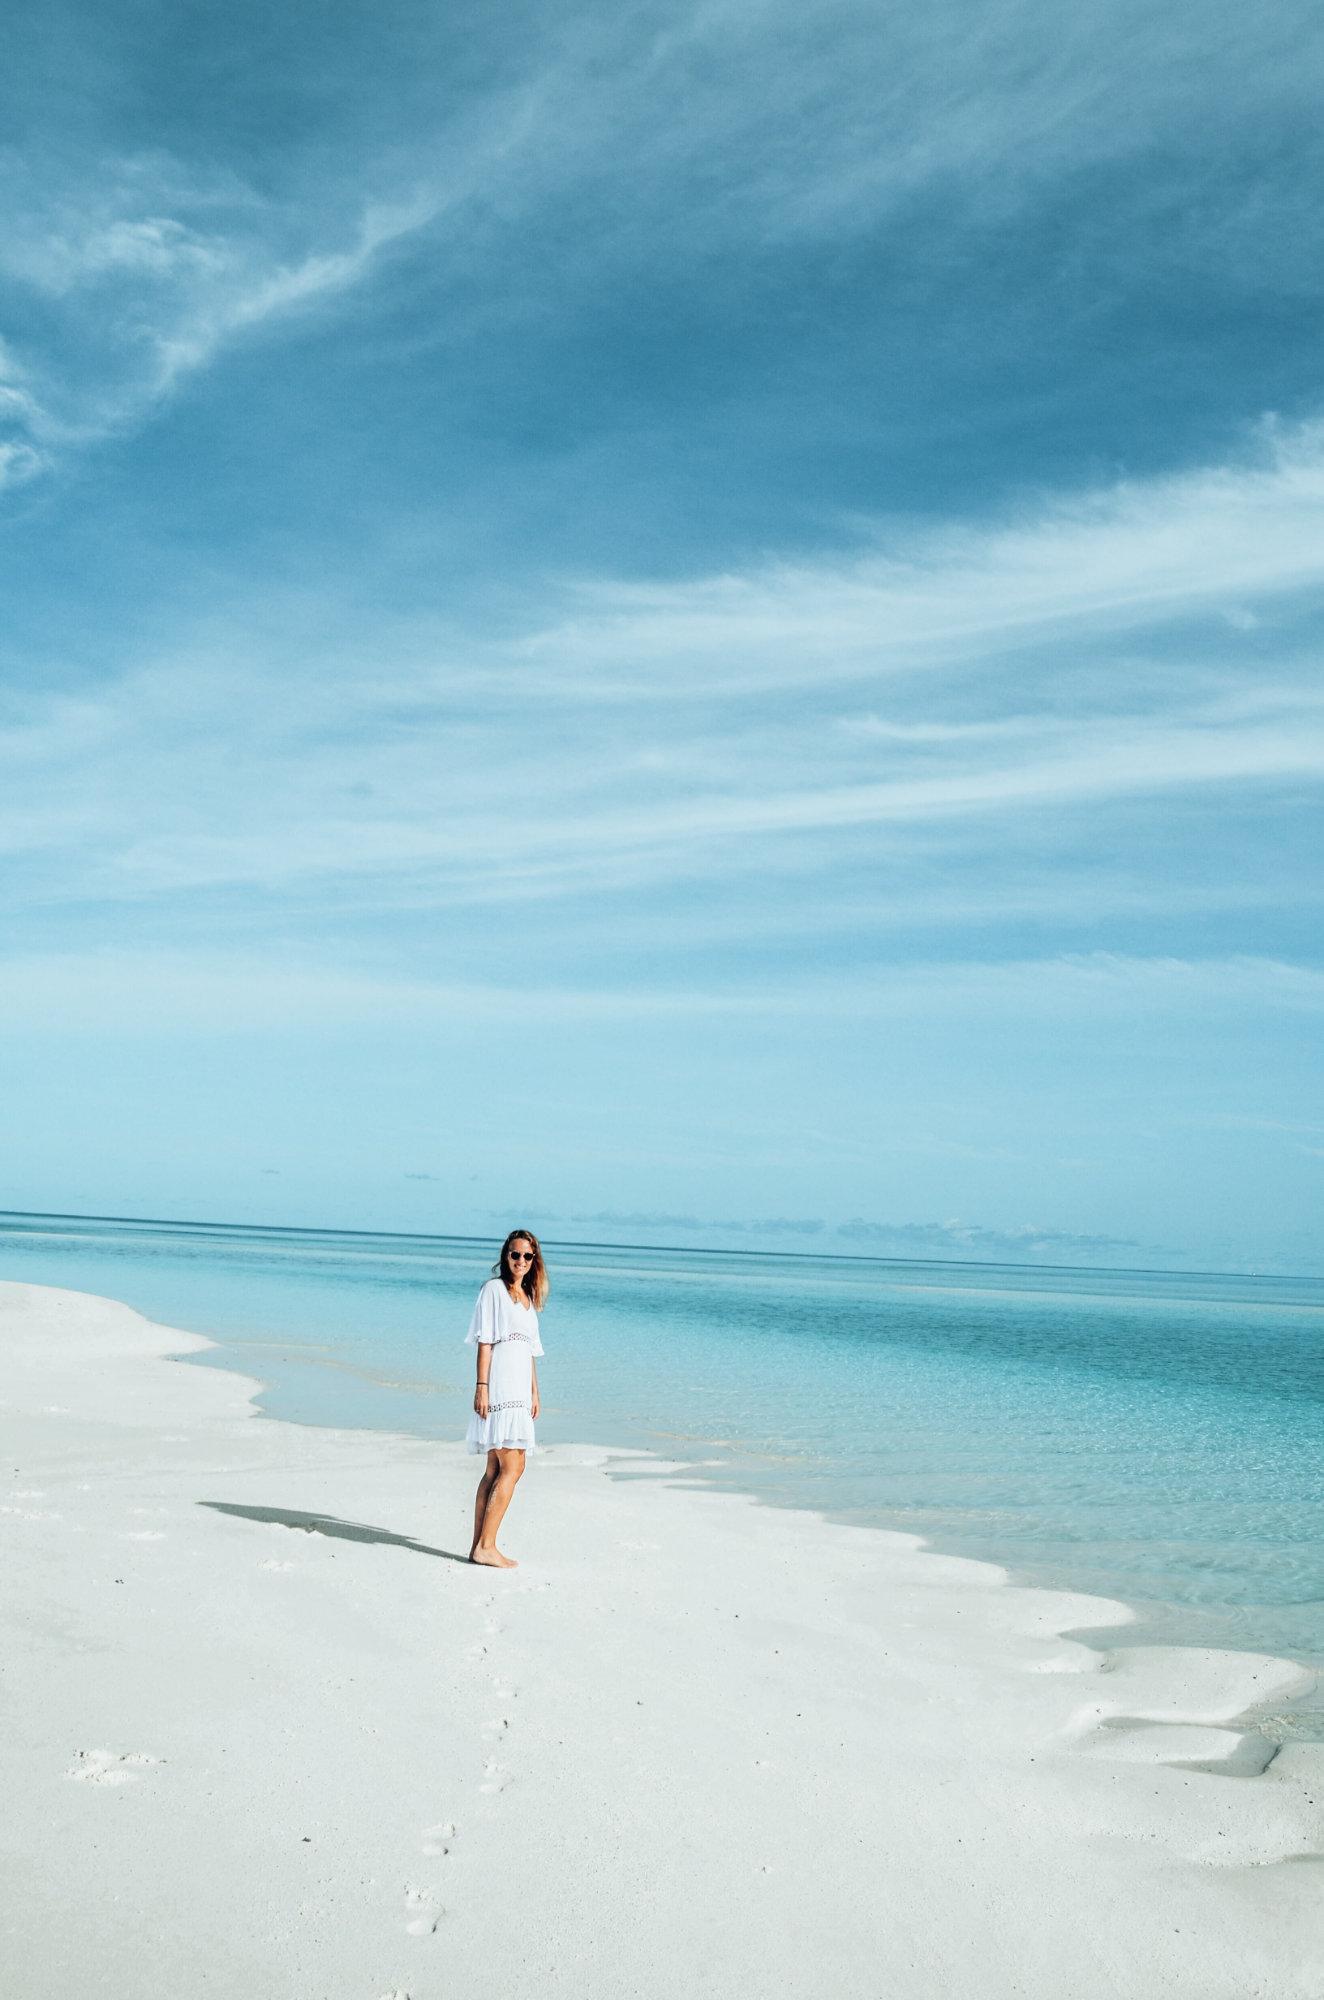 Sandbank Malediven